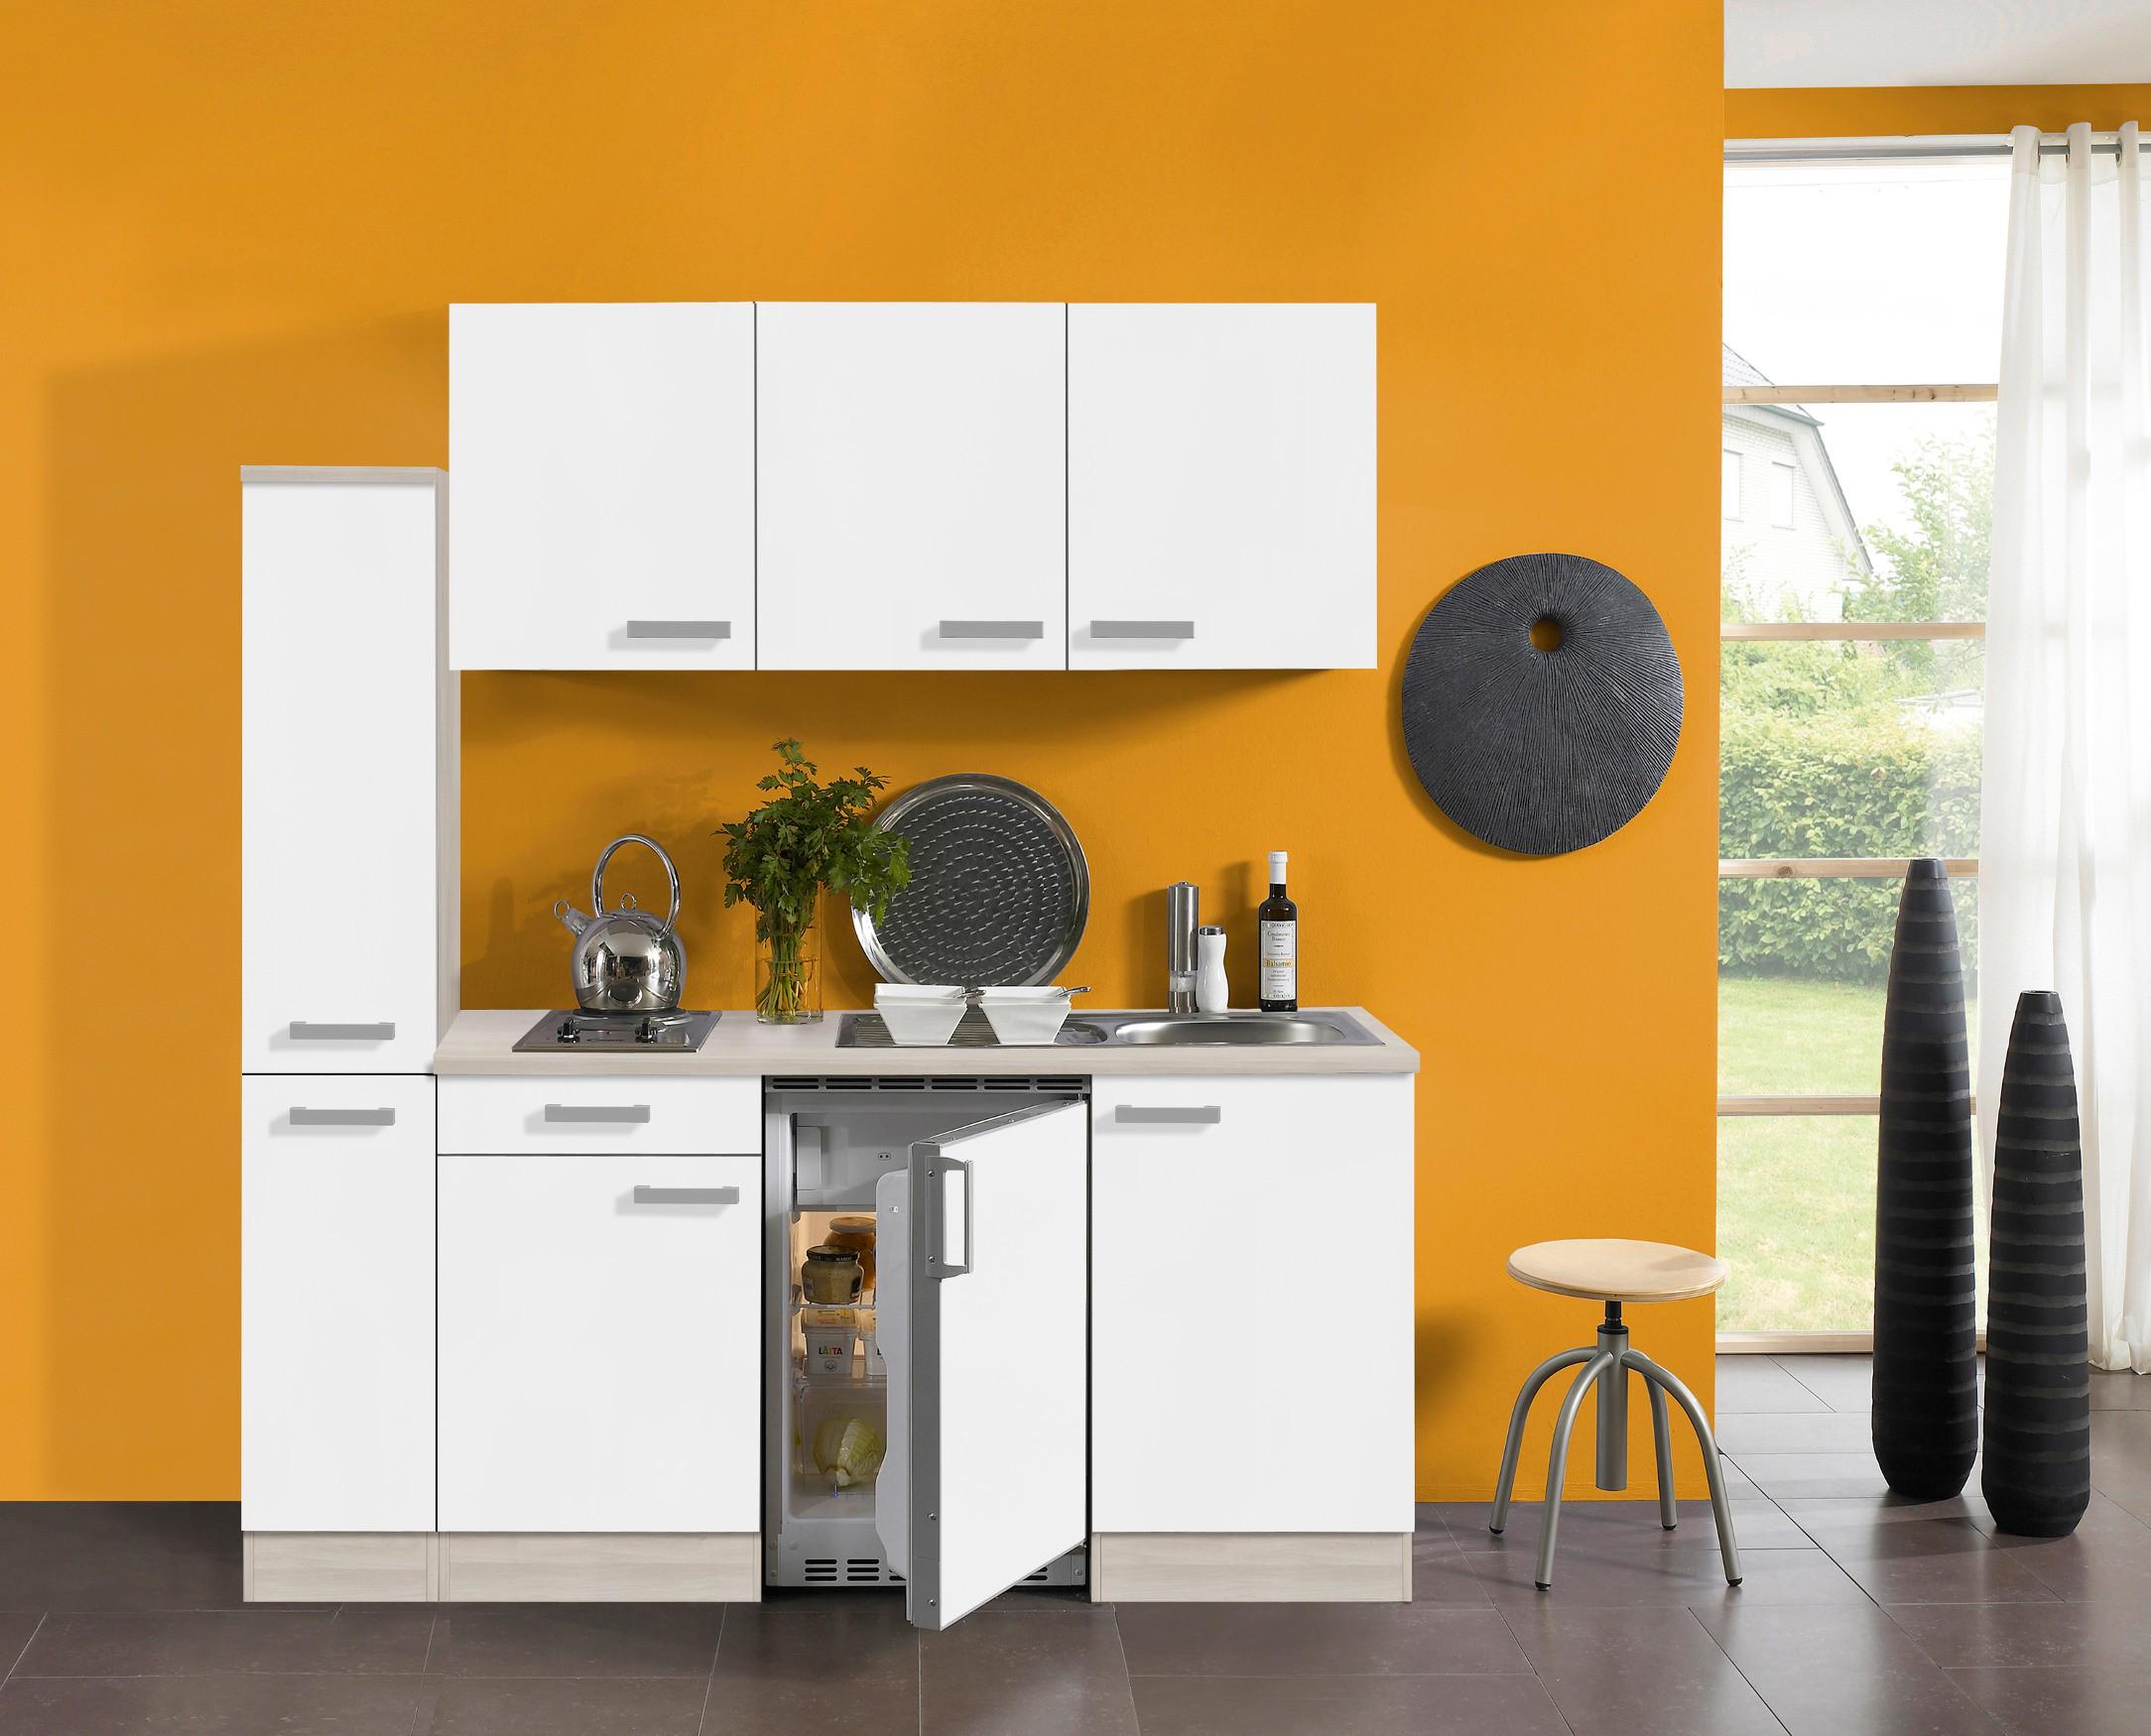 Miniküche Mit Kühlschrank 180 Cm : Singleküche barcelona mit elektro kochfeld teilig breite